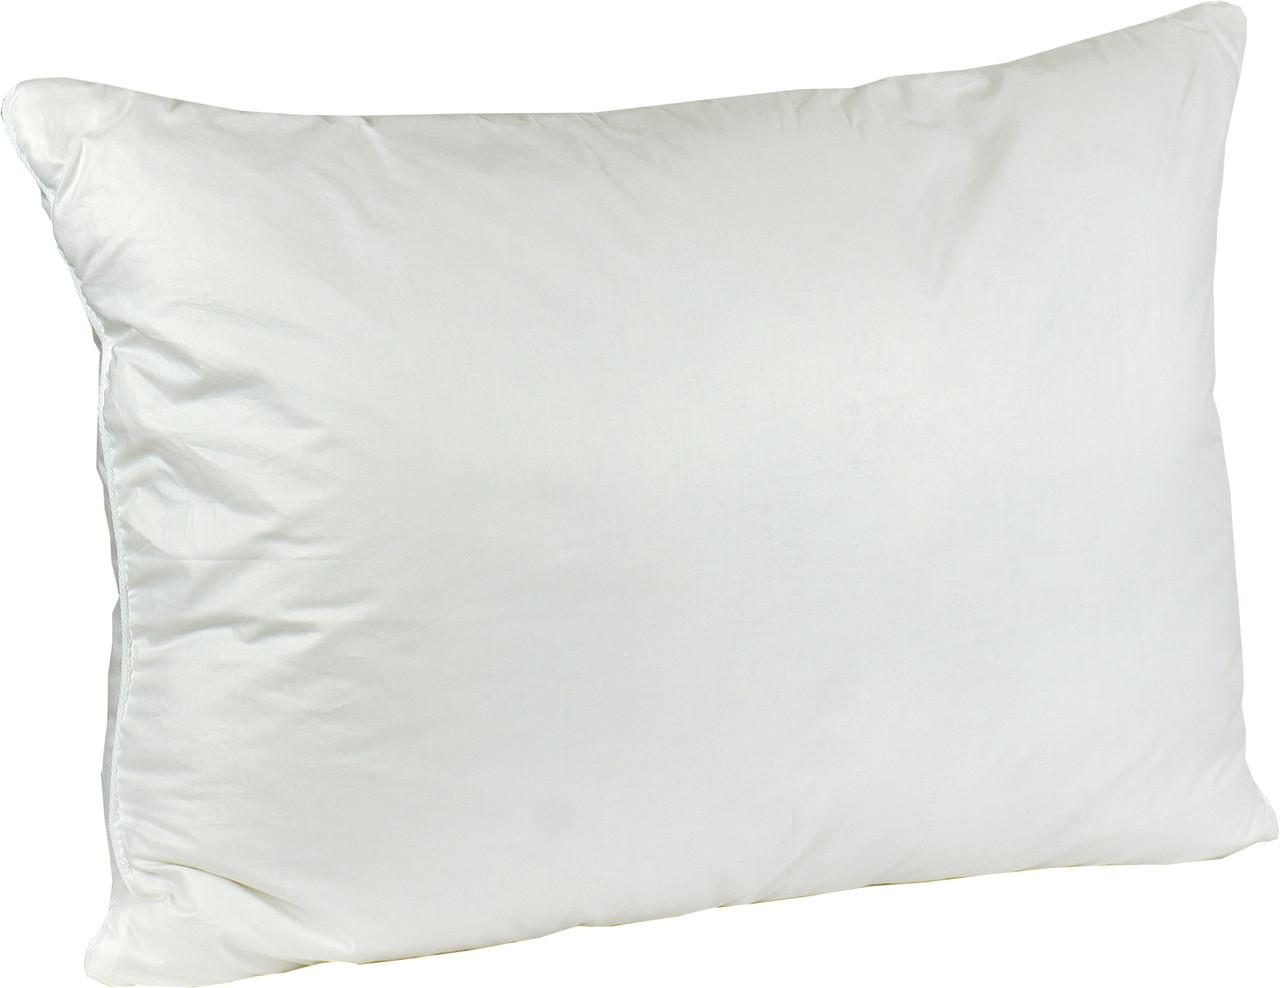 Подушка Руно  овечья шерсть 50х70  тик (310ШУ)